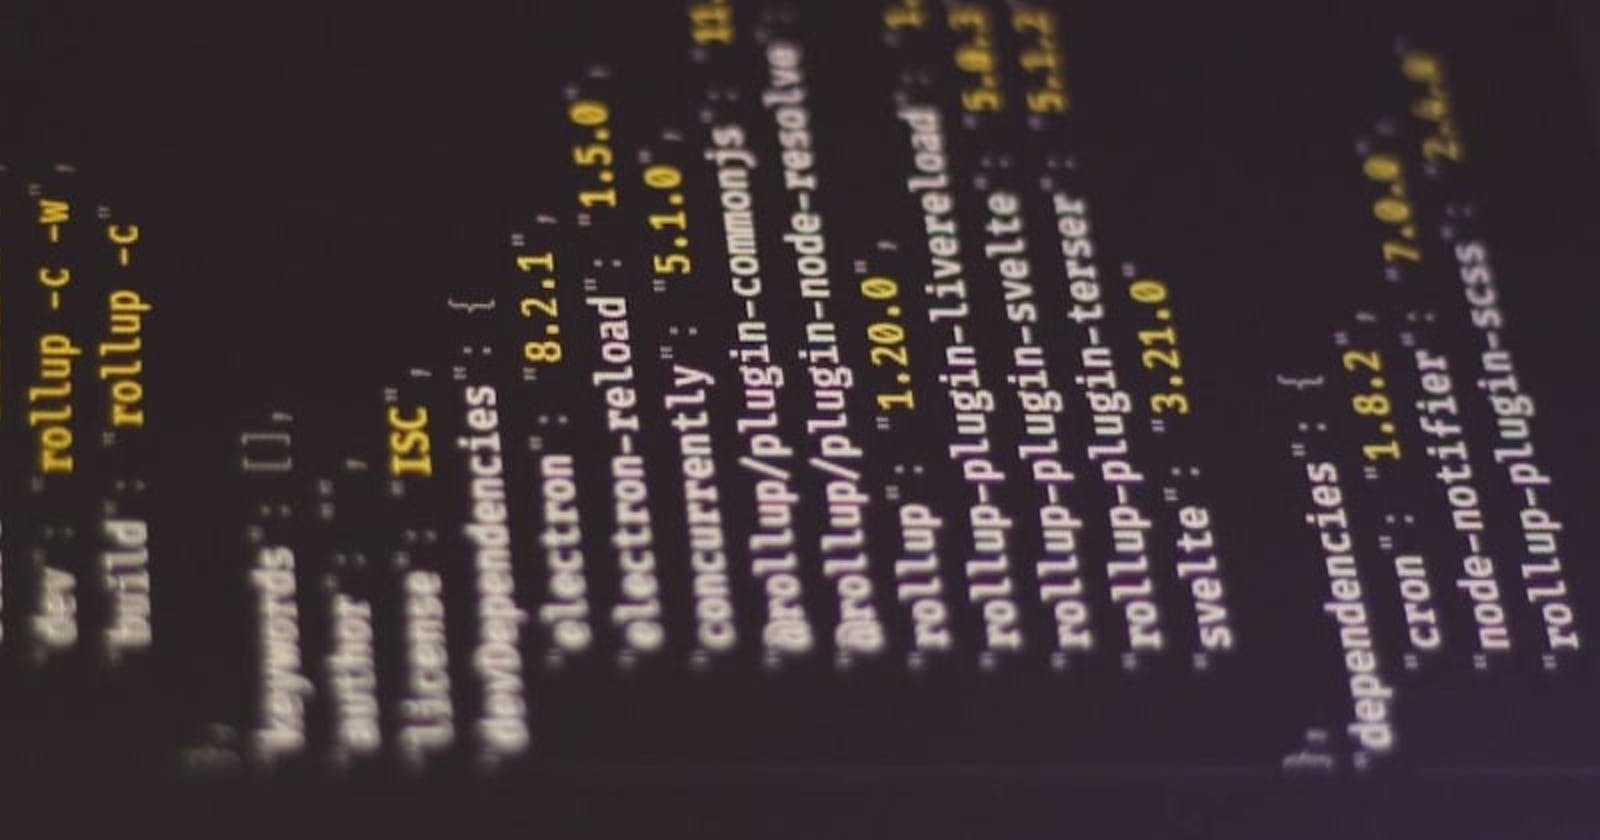 16 Useful WebSites for Frontend Engineers